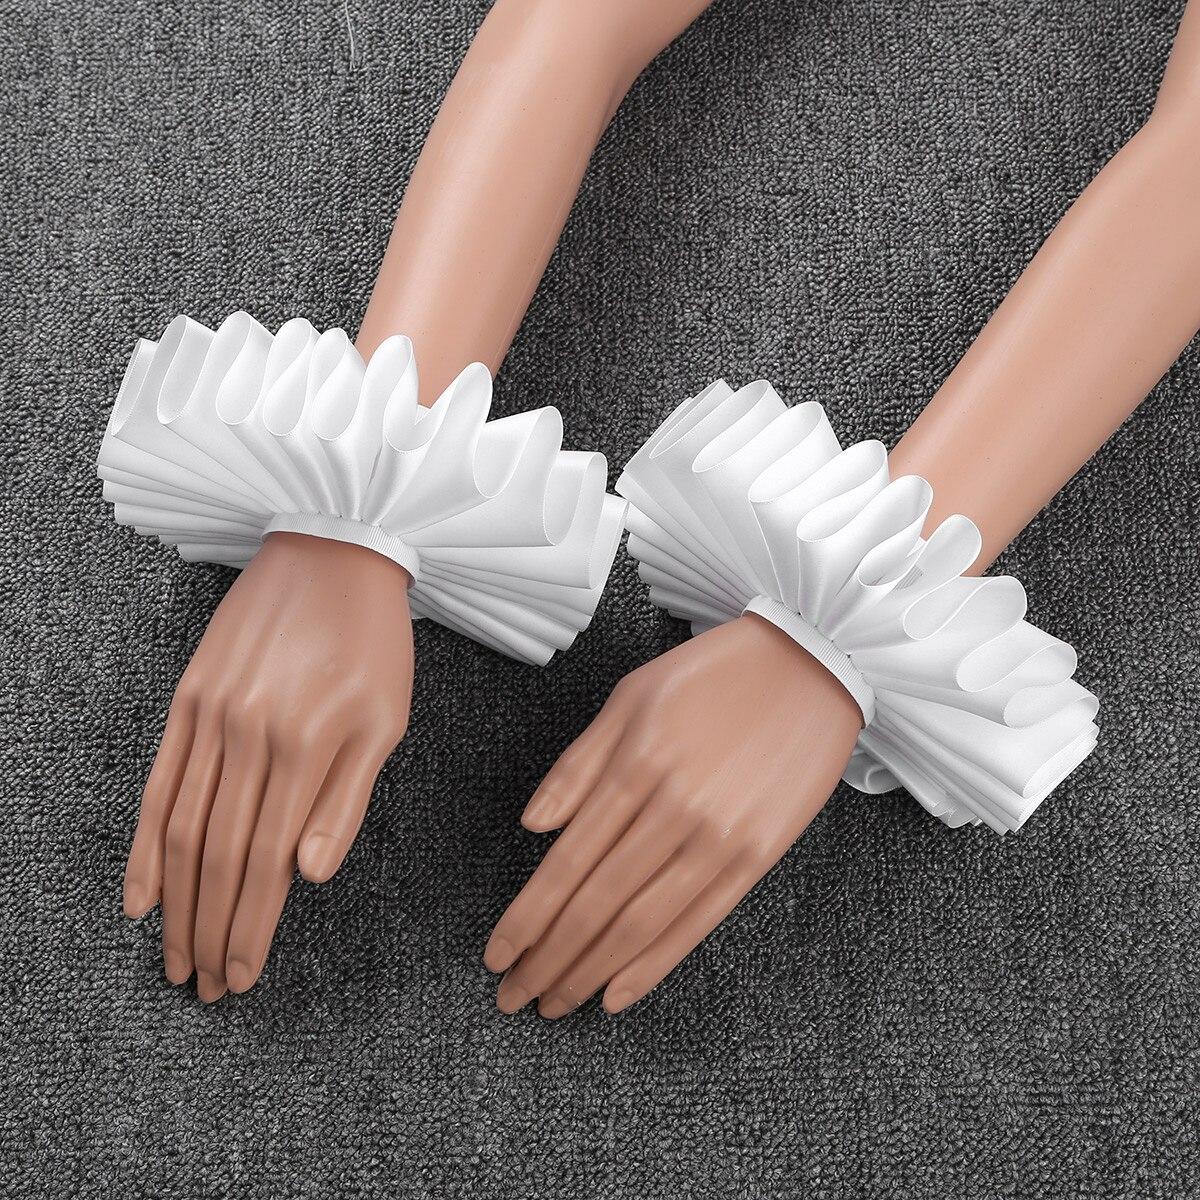 MSemis Women Men Renaissance Elizabethan Ruffled Wrist Sleeves Cuffs Bracelet Victorian Costume Halloween Cosplay Accessories